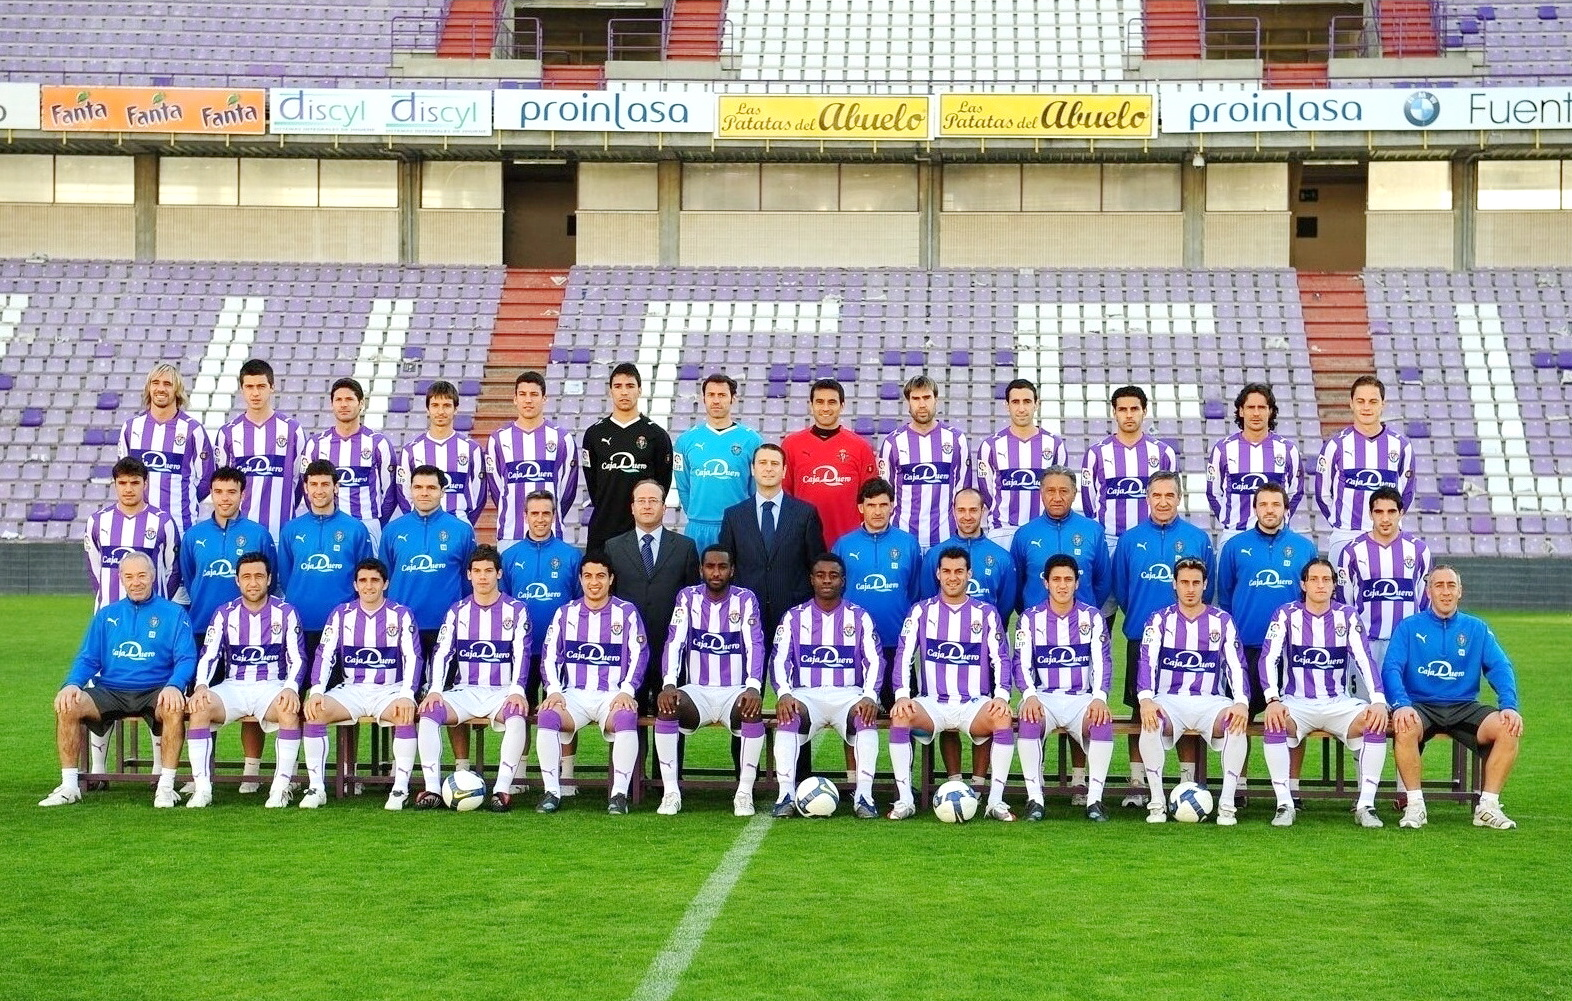 ¿Cuánto mide Sergio Asenjo? - Altura - Real height Valladolid%2B2008%2B08%2B01